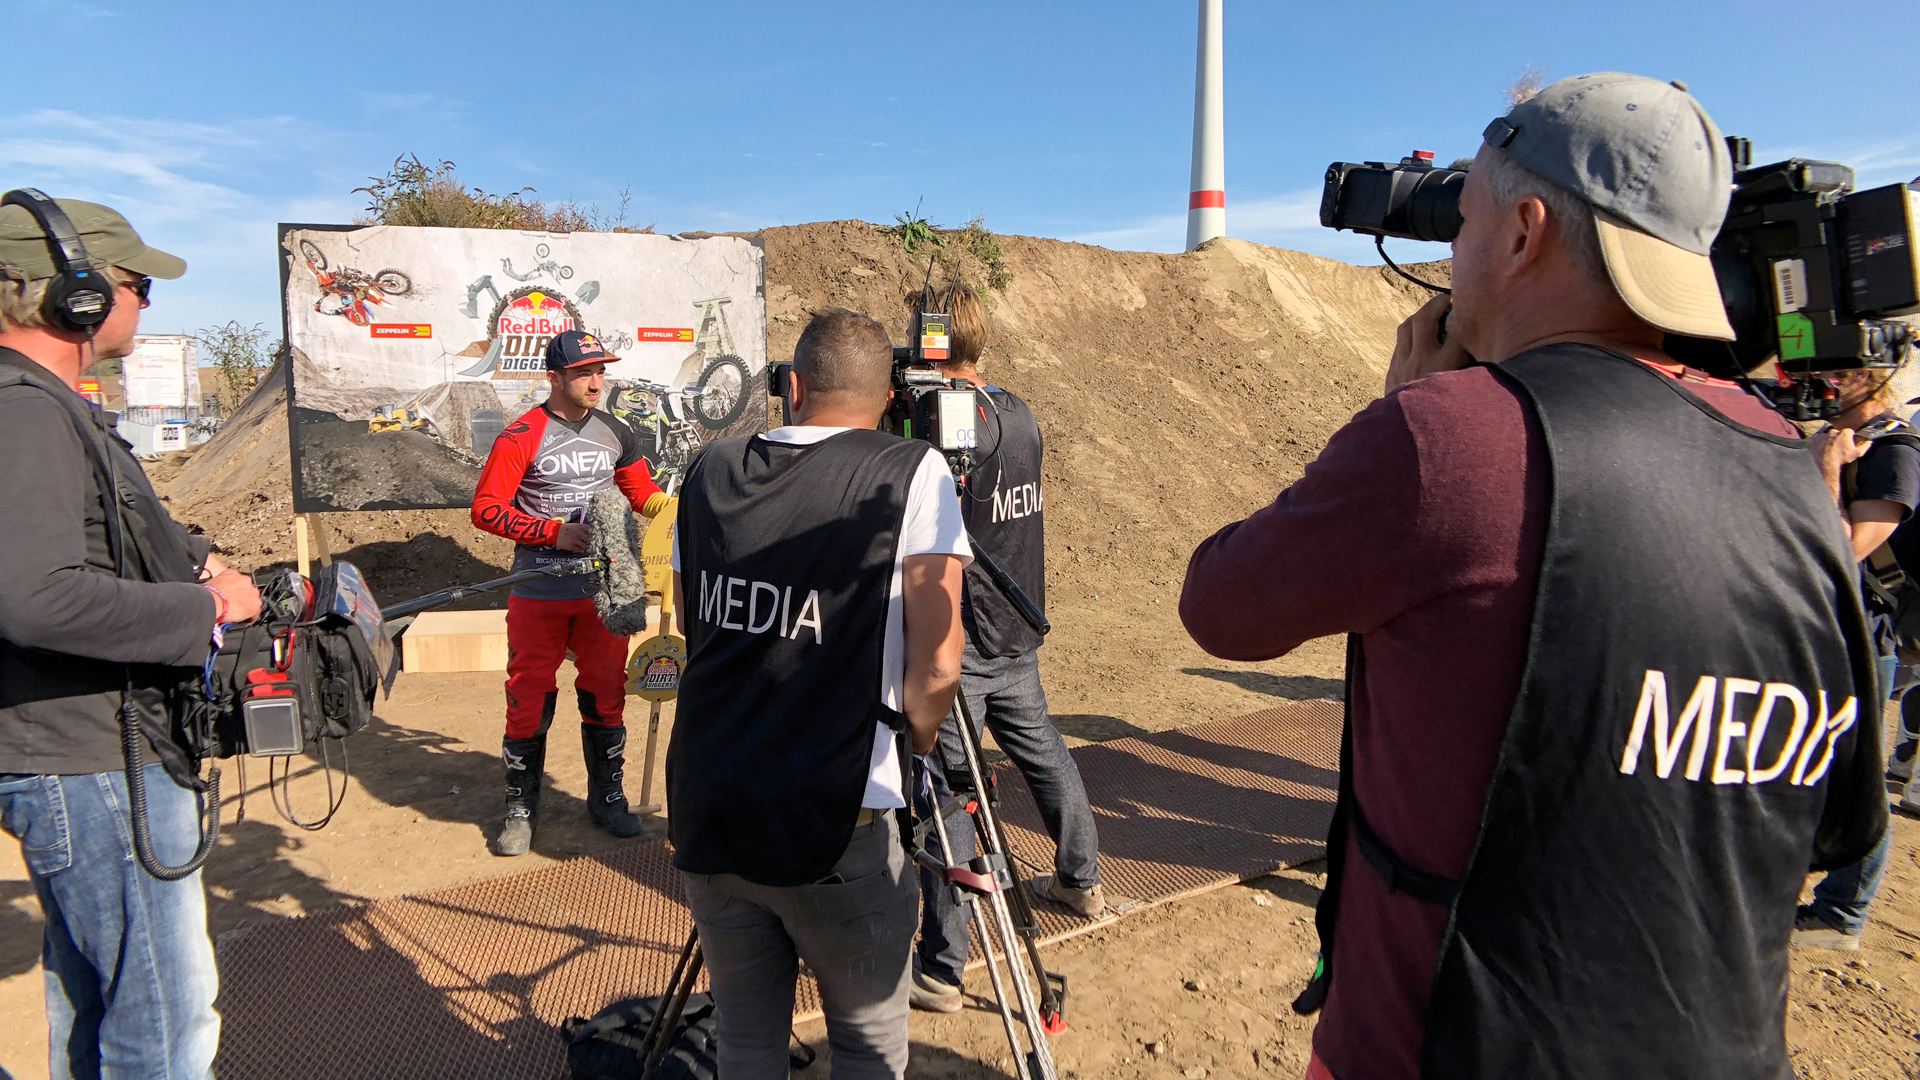 Red Bull Dirt Diggers - BTS Crew Event Winner ITV